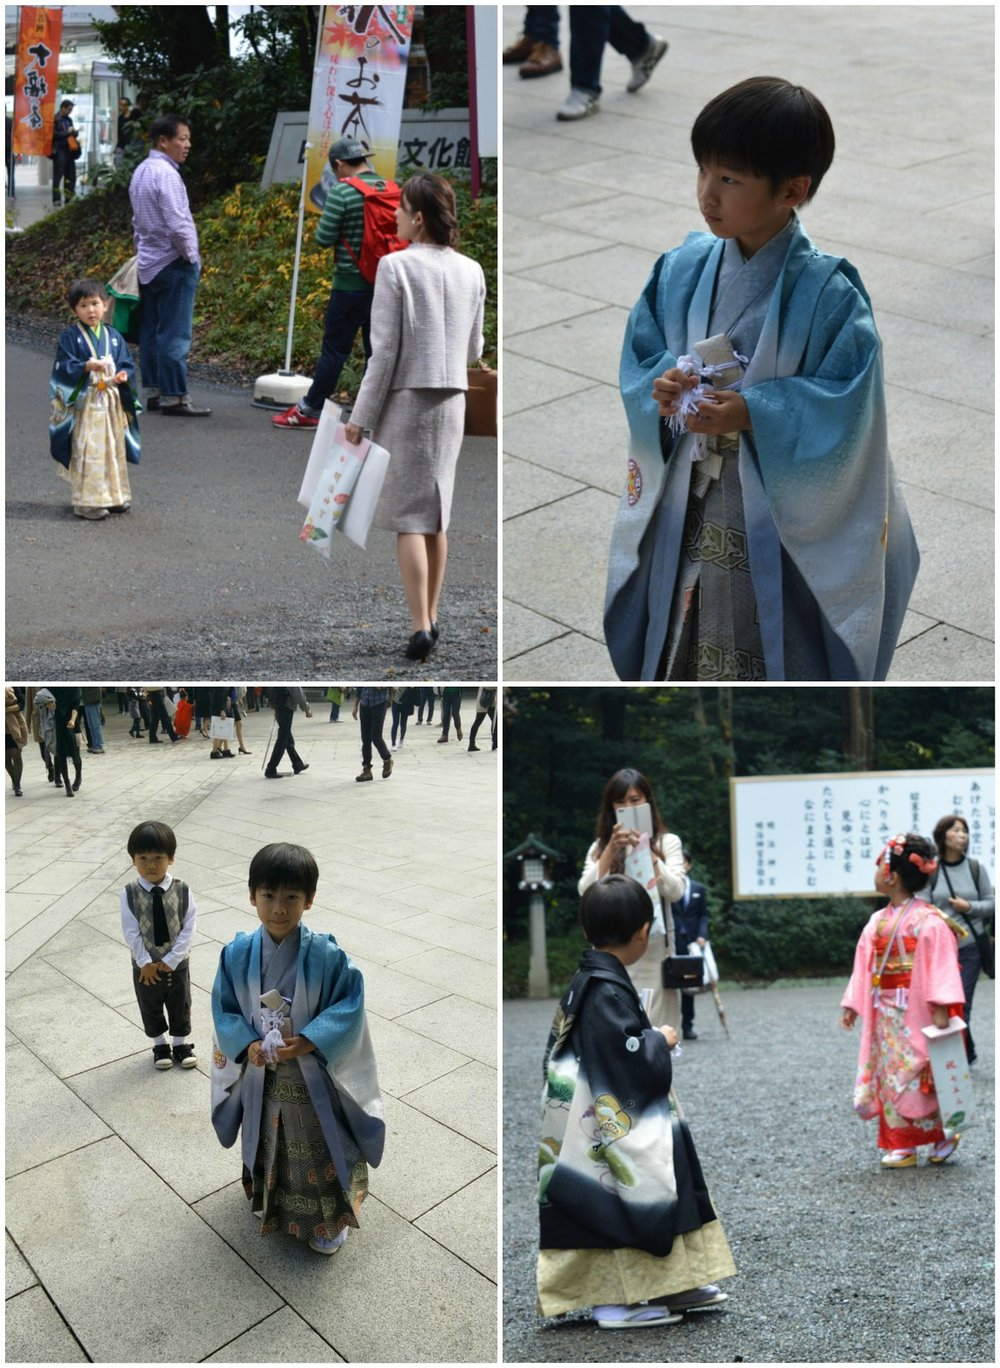 Japanese wedding - more cute children